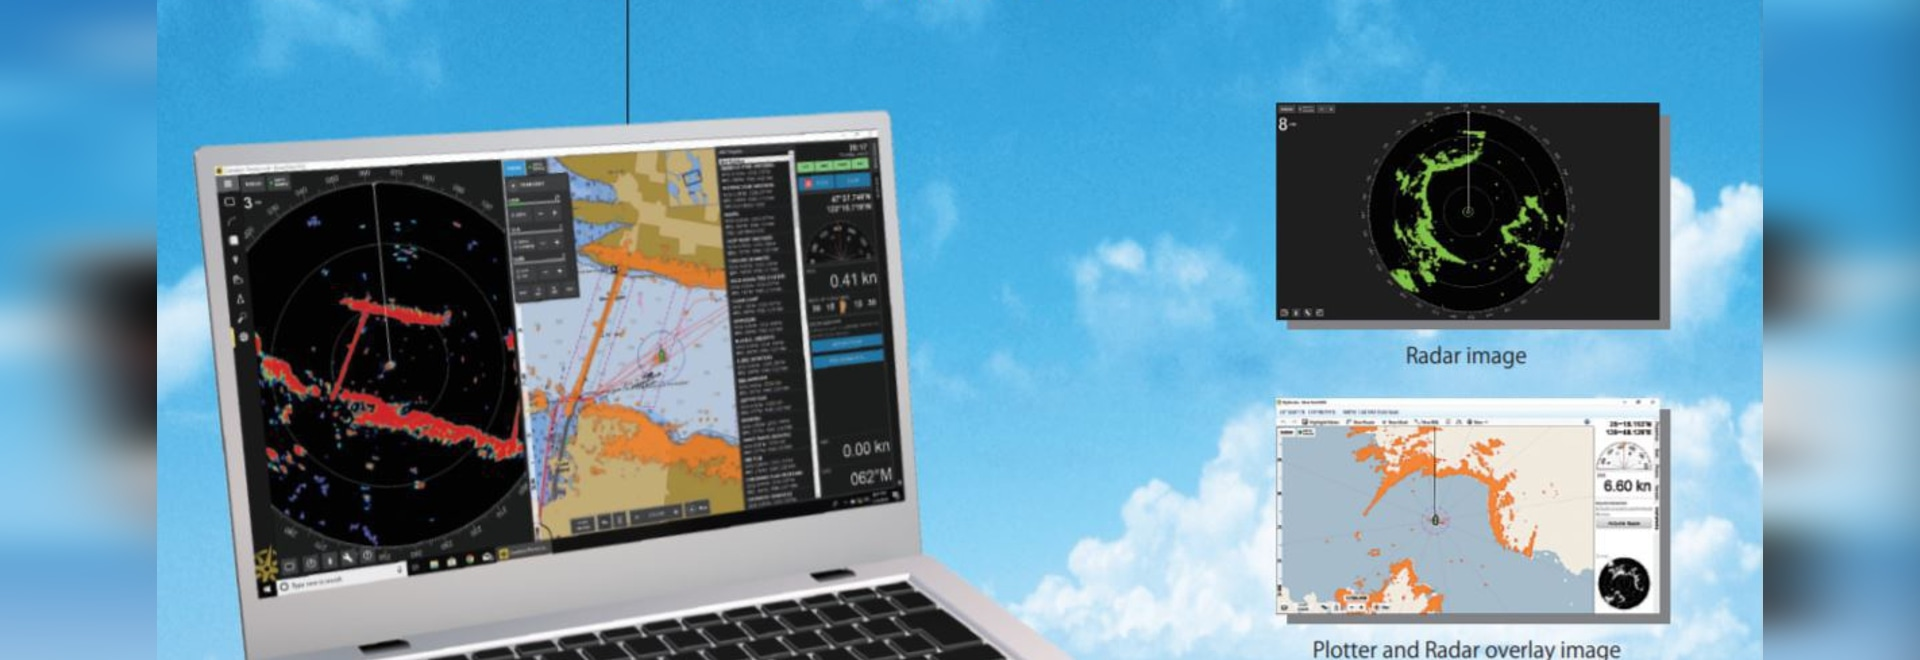 MIBS2020: Koden MDS-11R RADARpc, radar for Coastal Explorer